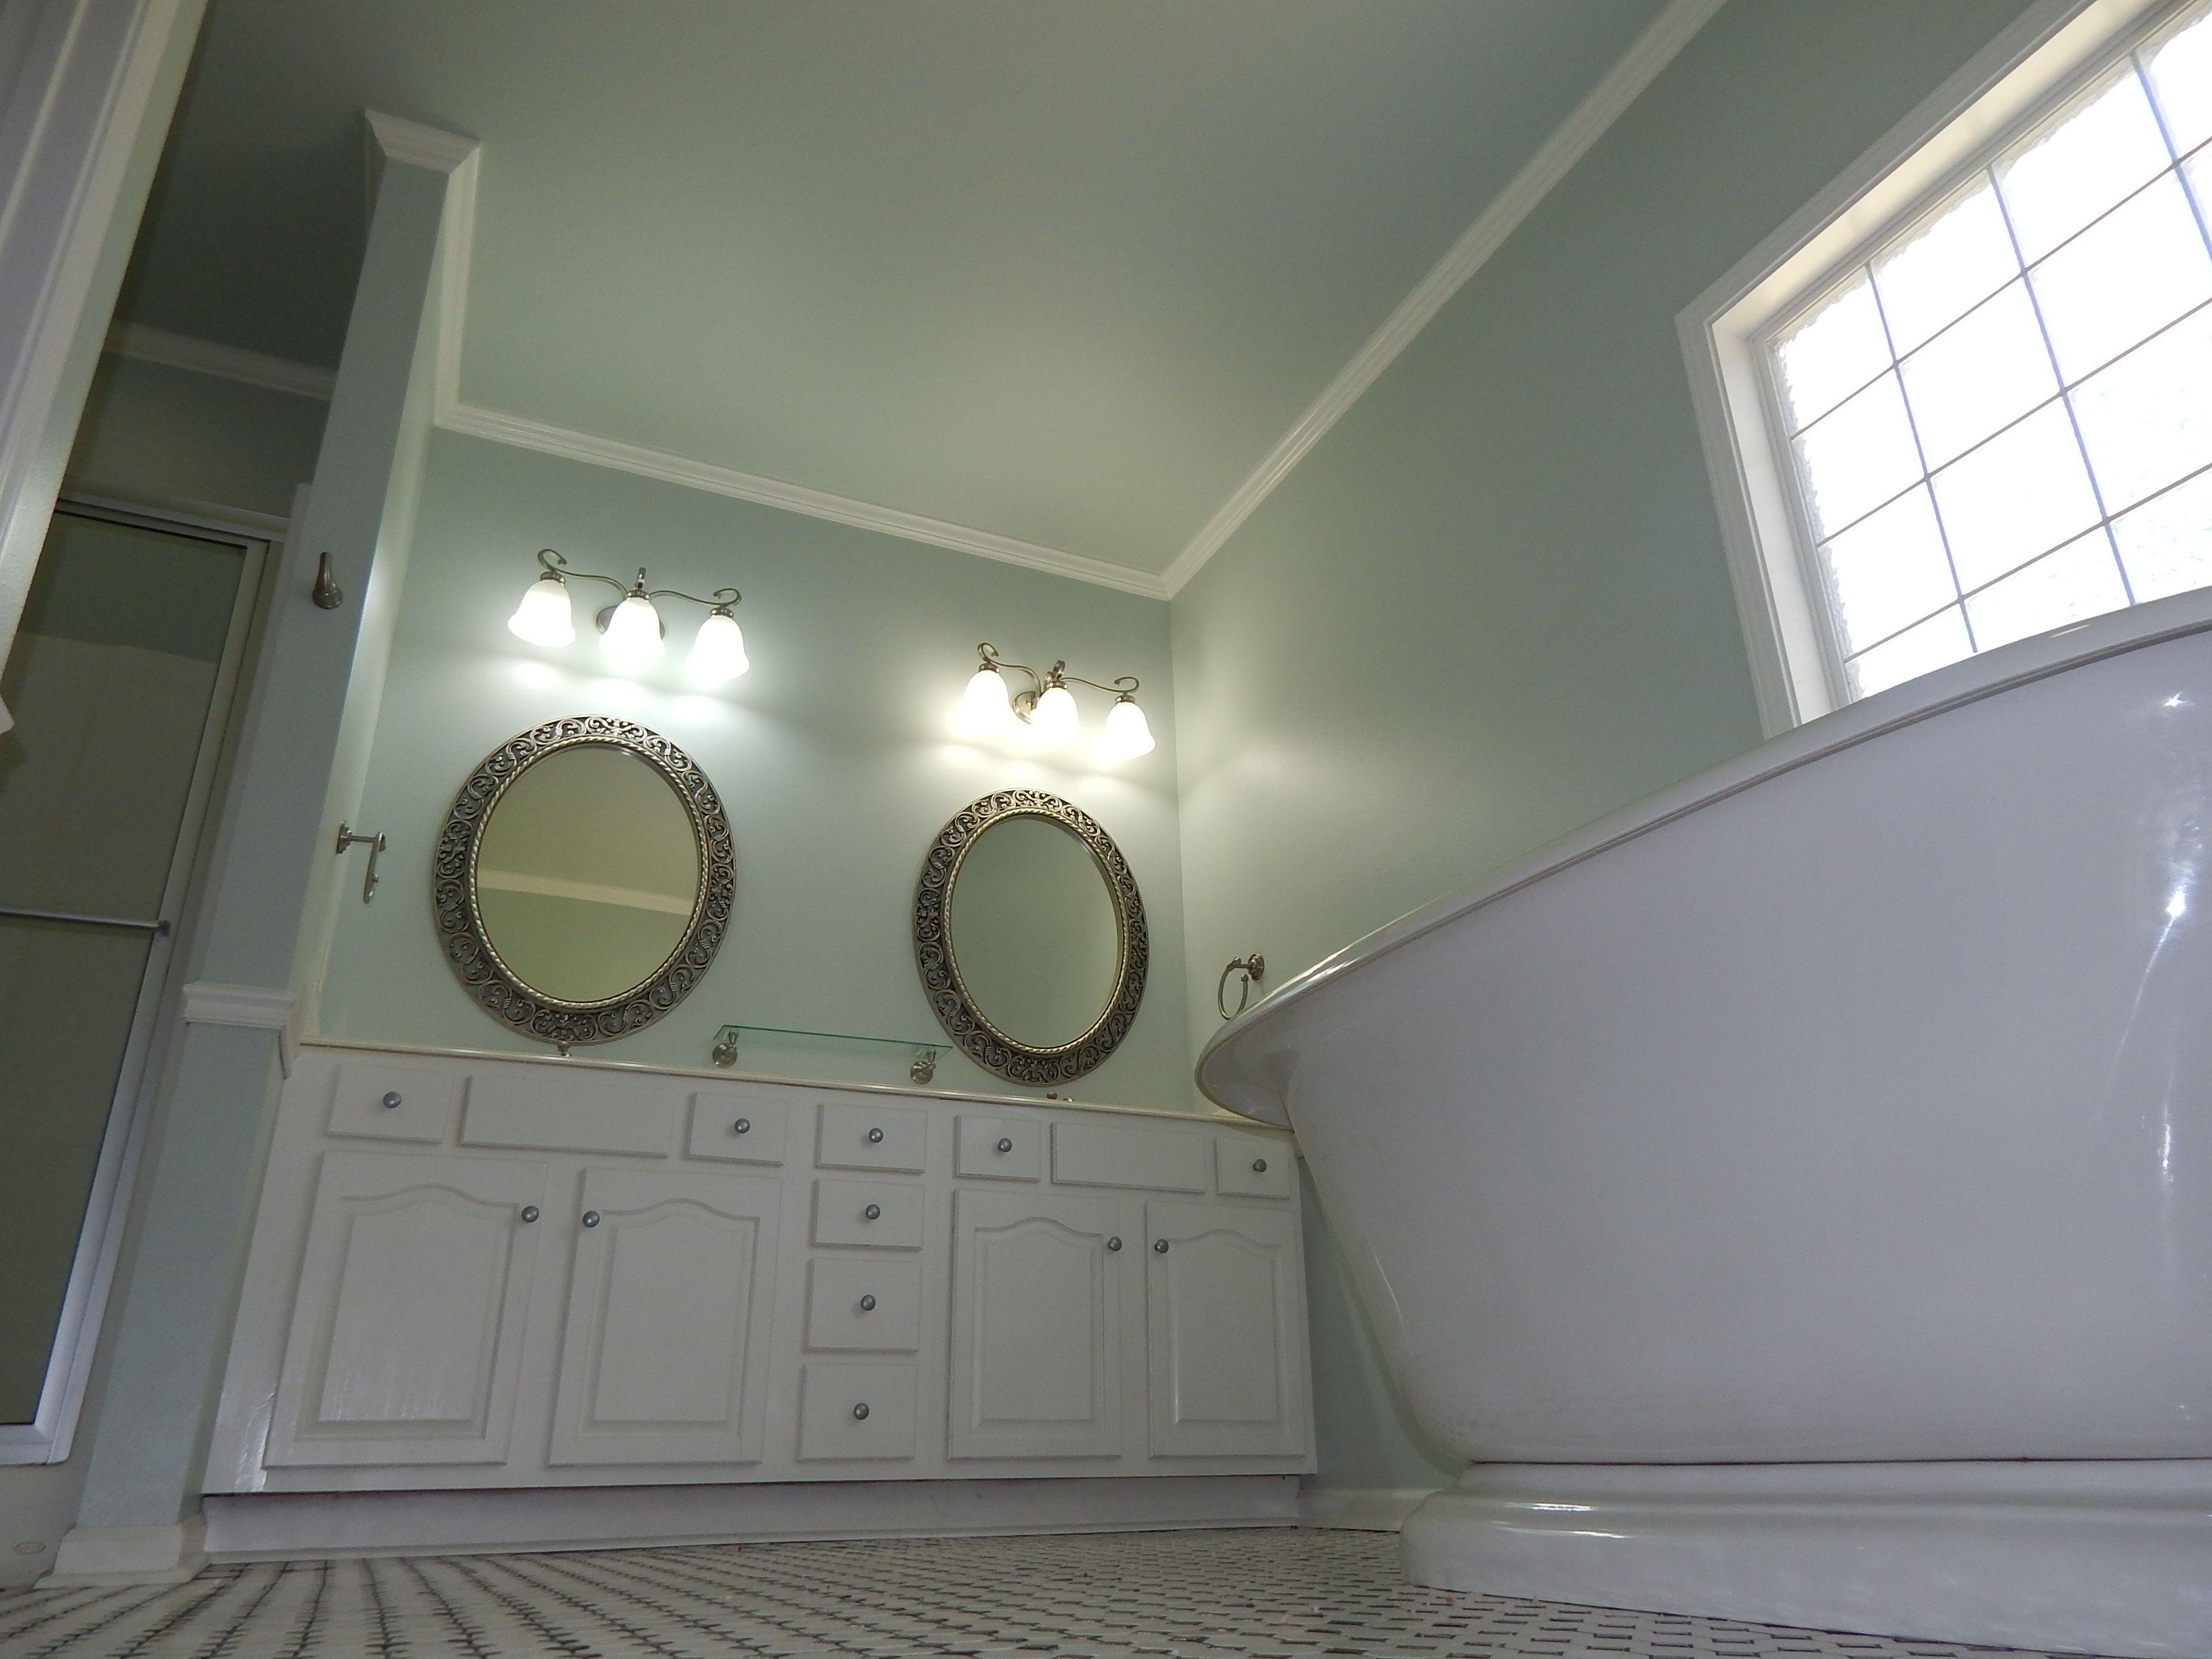 trim cabinets sherwin williams greek villa sw 7551